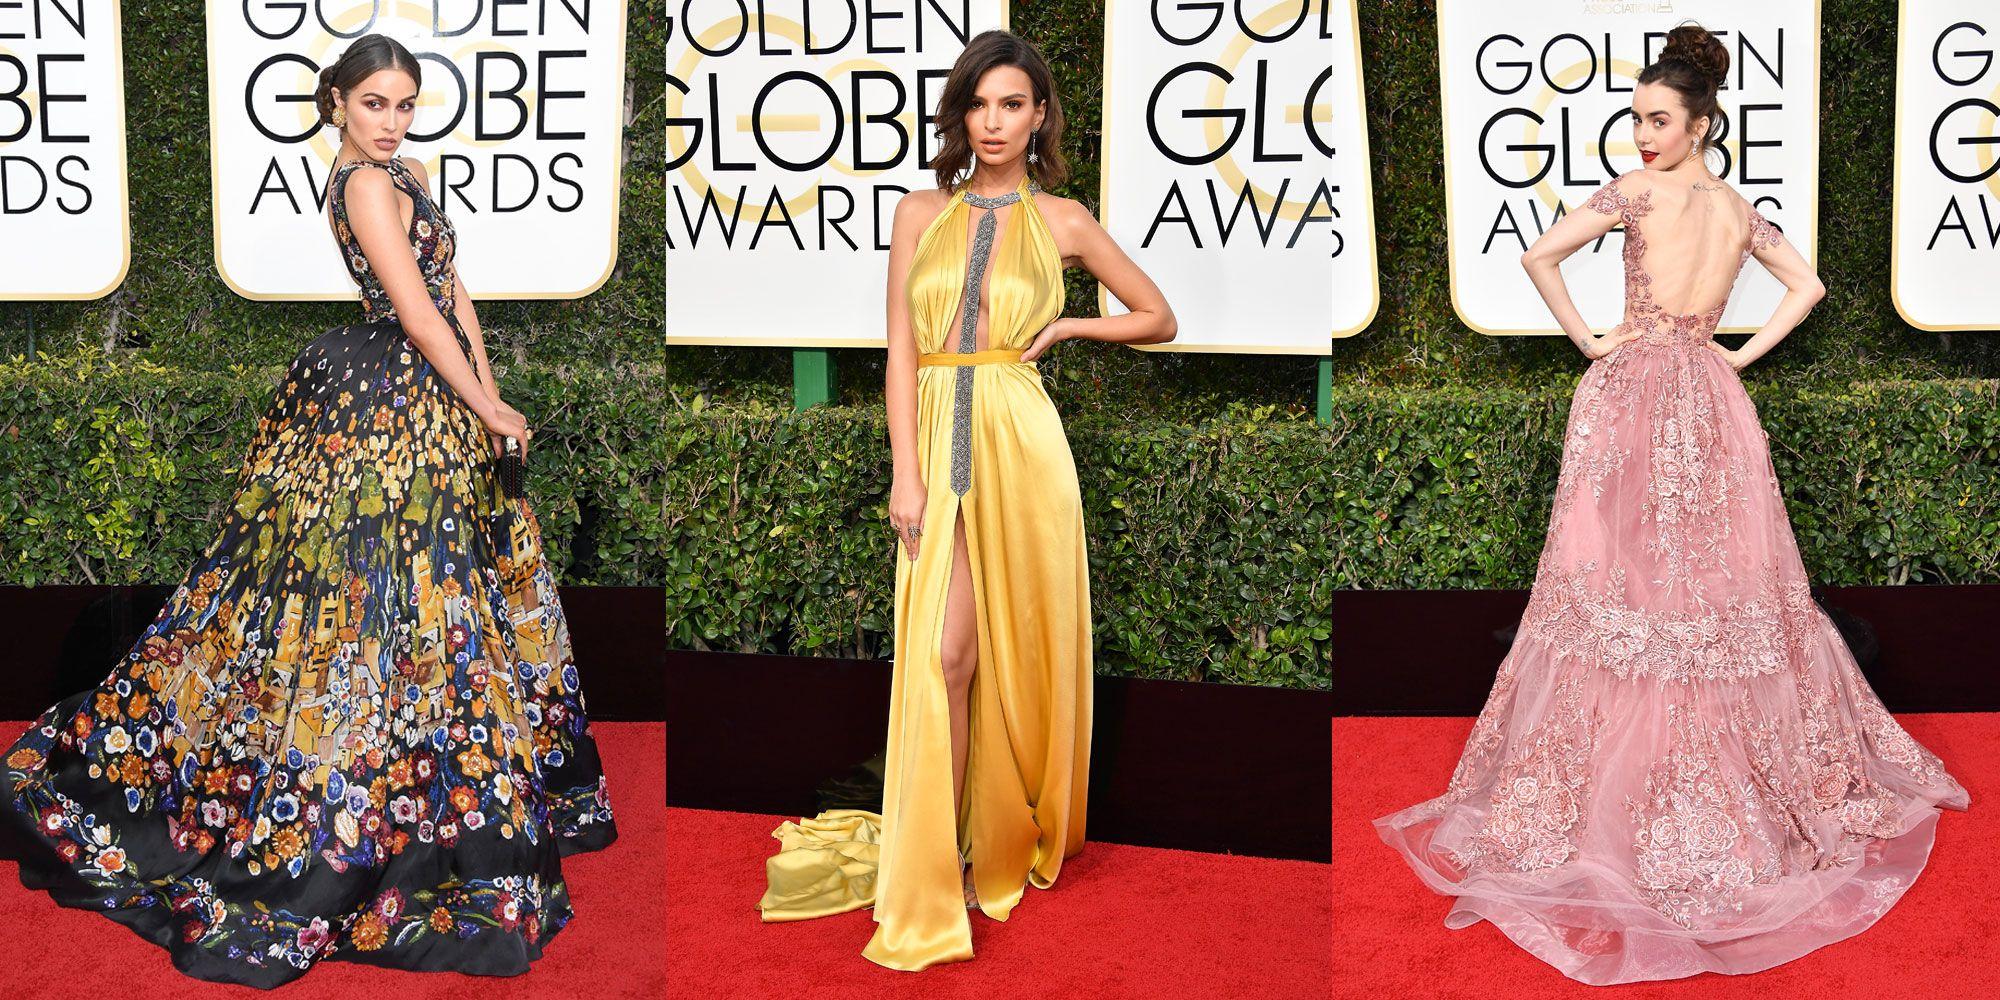 buy golden globes dresses